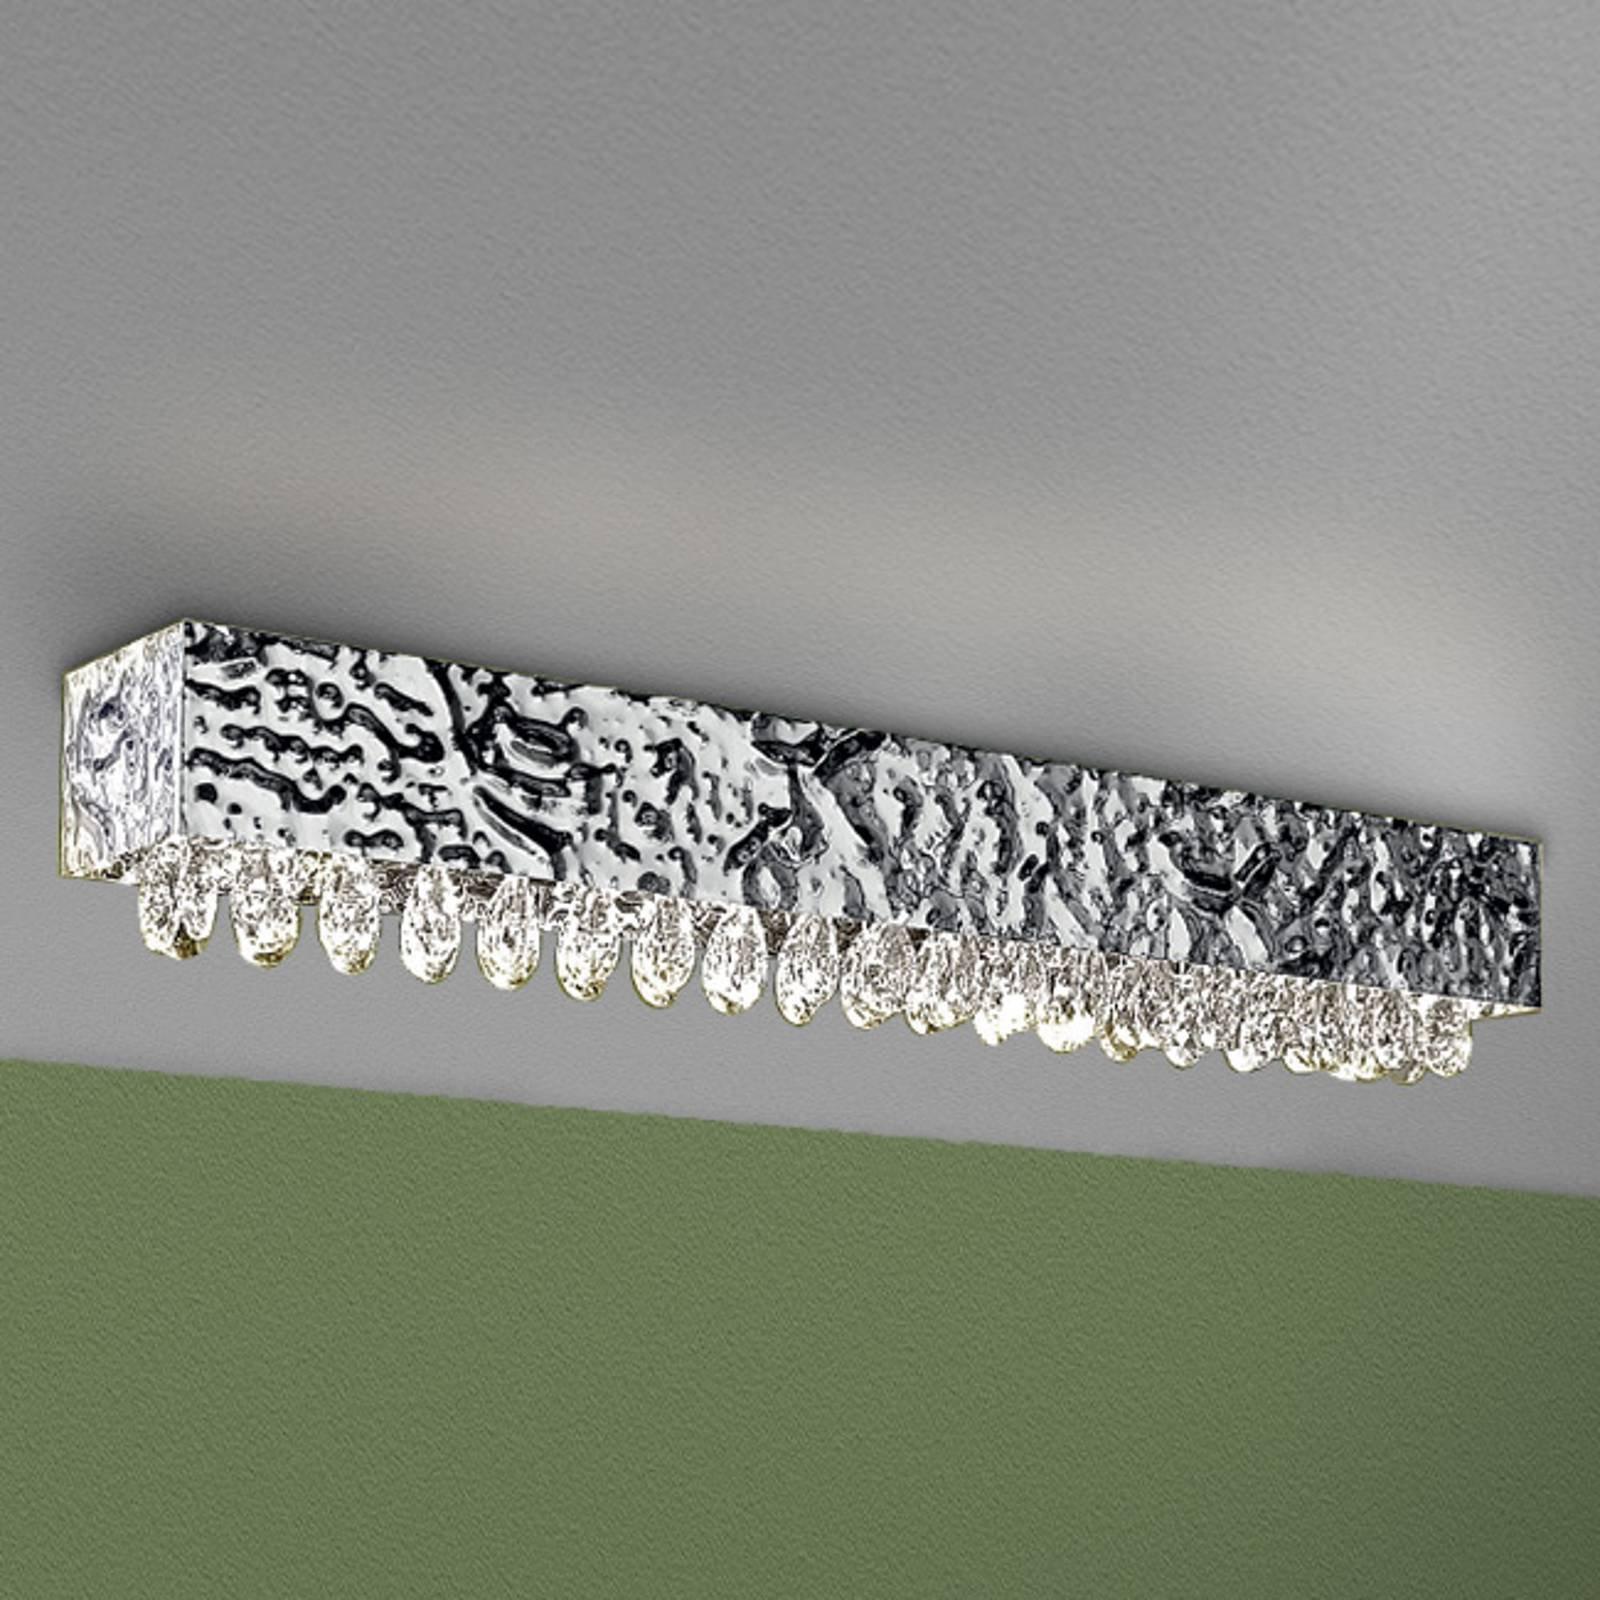 Taklampe MAGMA, krystalloppheng klar, 100x15cm